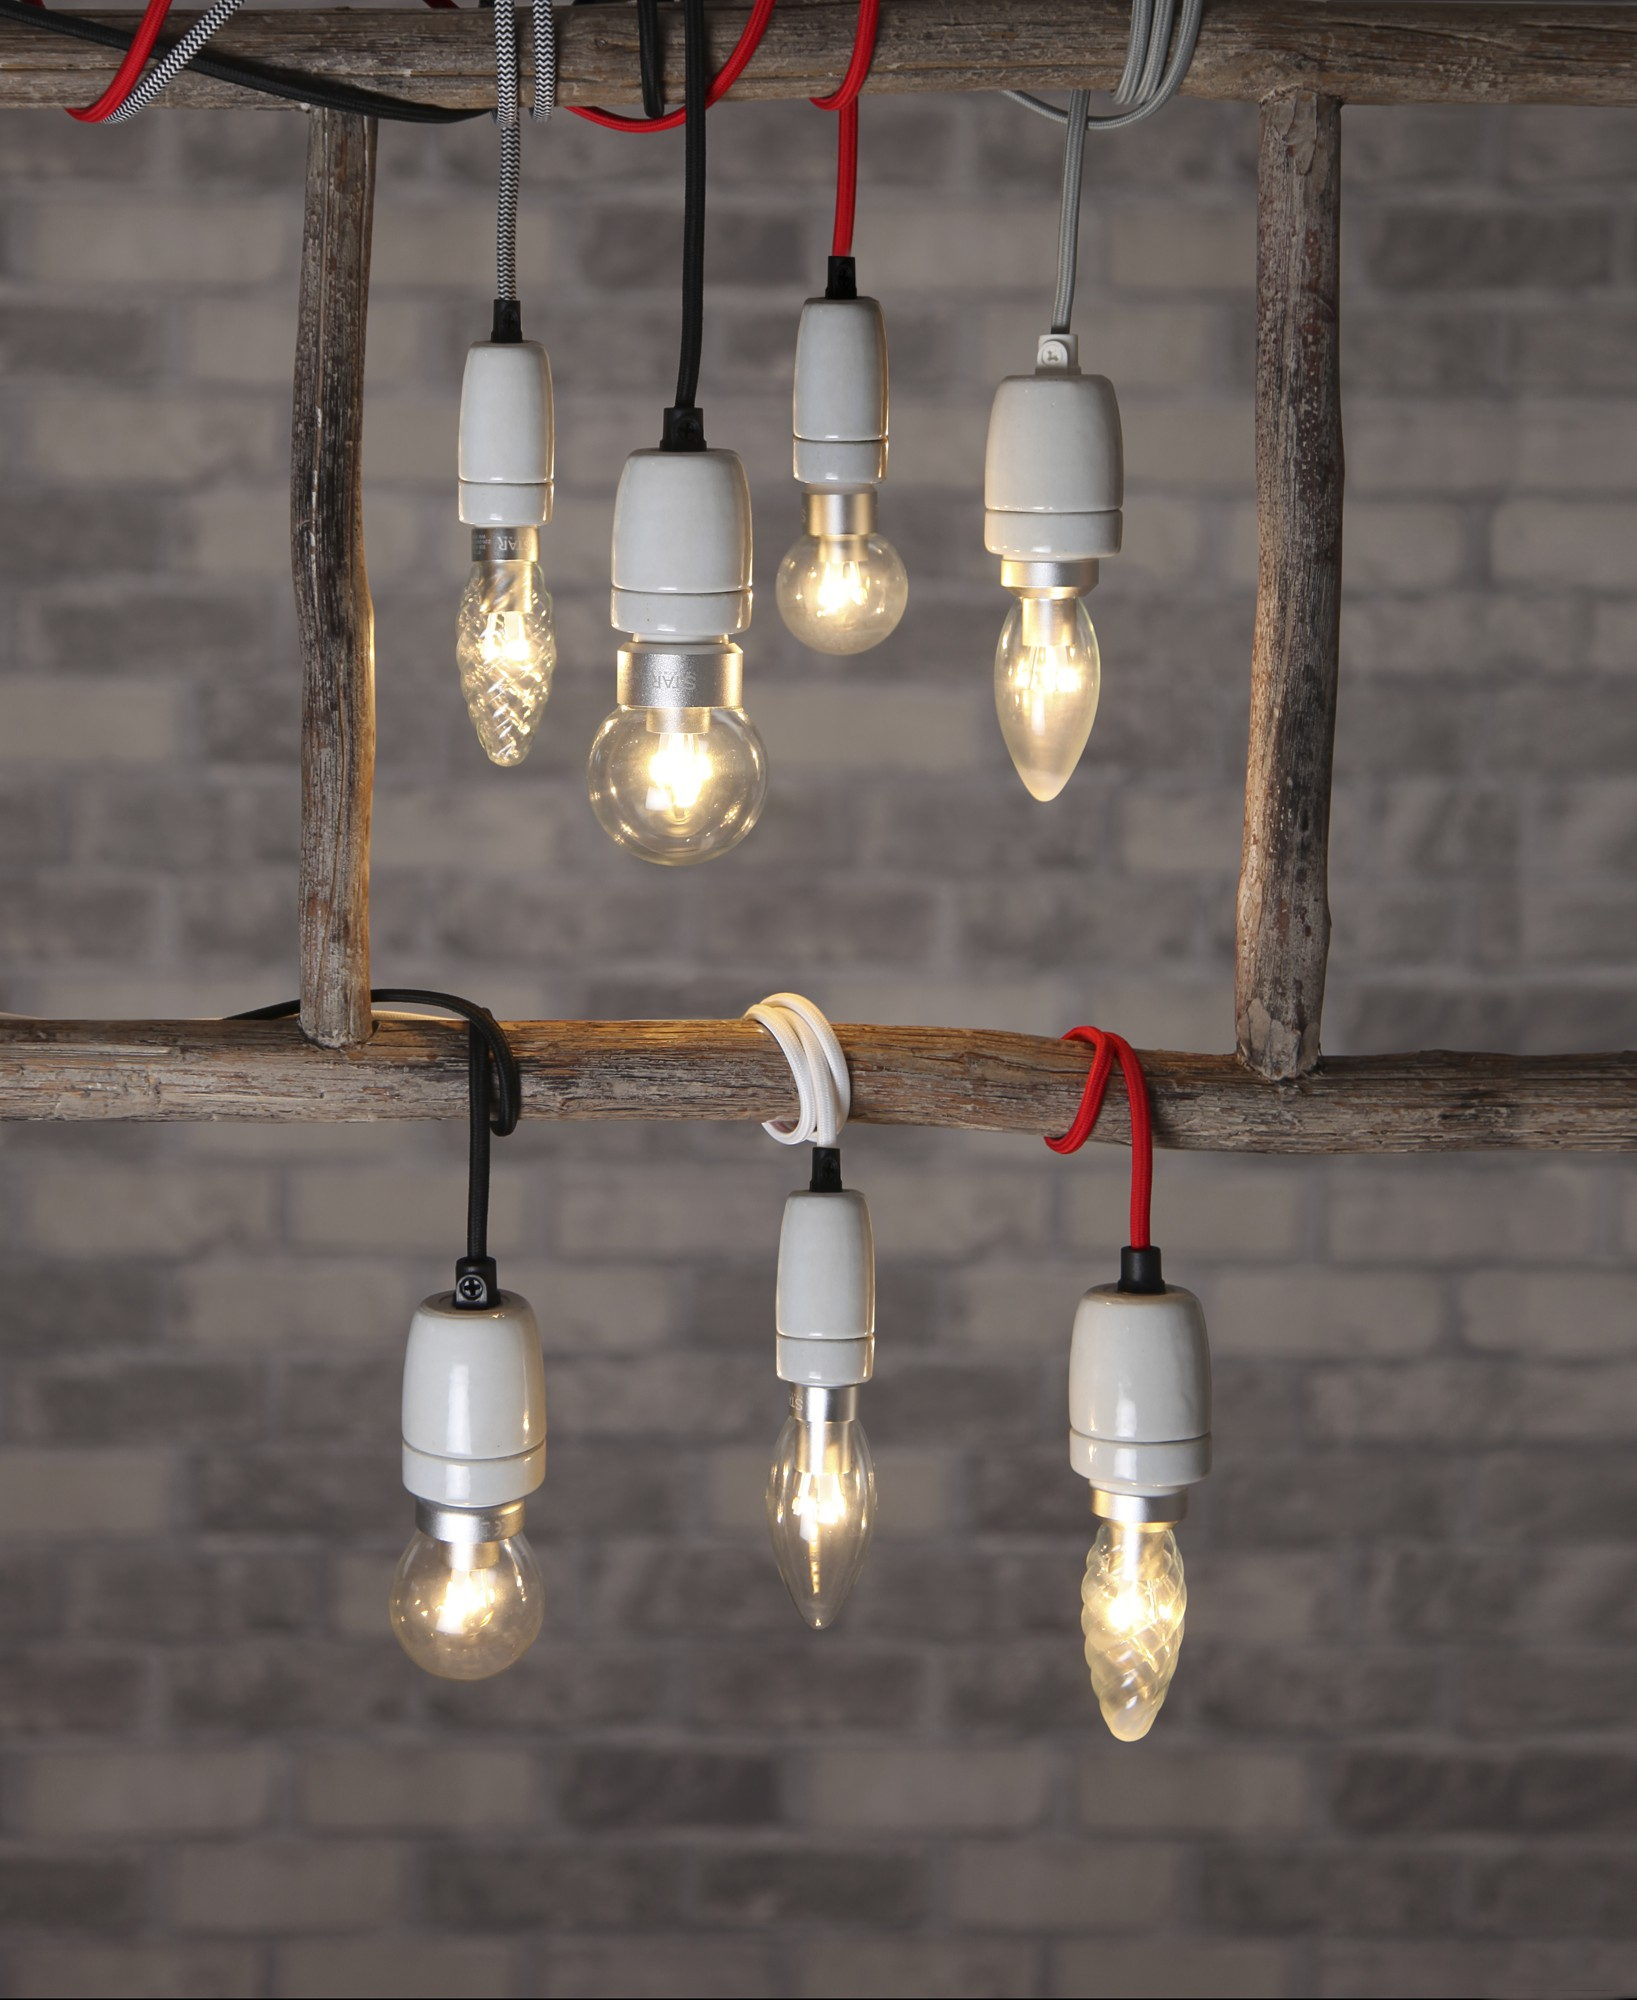 LED-lamput E230V - LED-lamput - Rautakauppa m